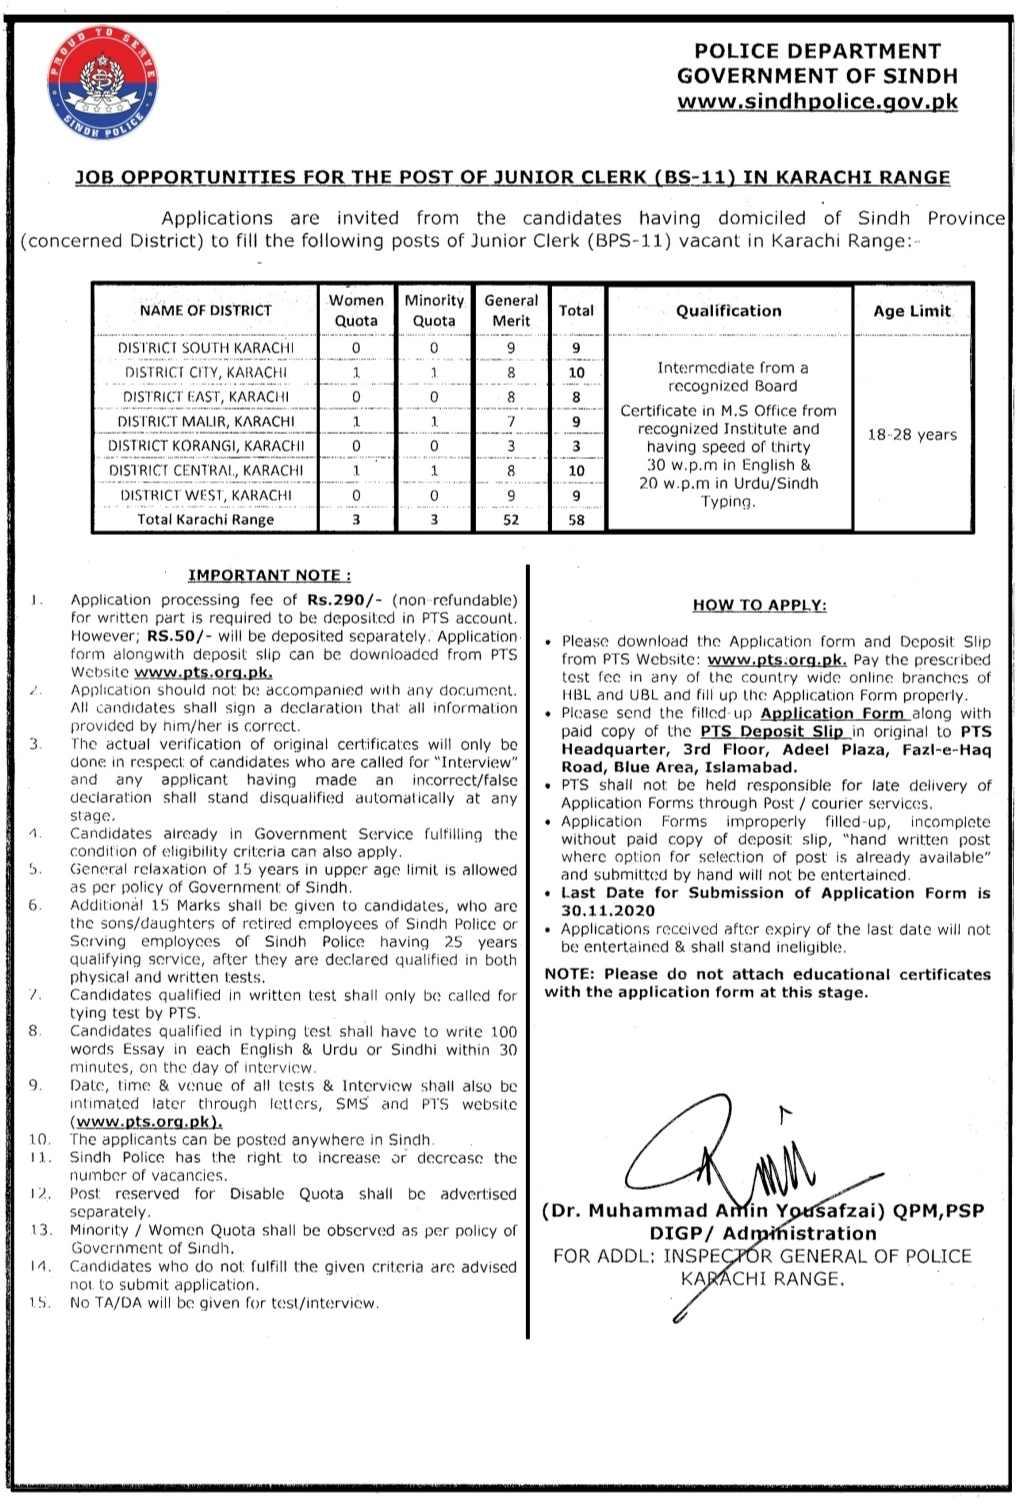 Karachi Region Sindh Police Junior Clerks (BS-11) Jobs 2020 Via PTS Apply Online 58 Positions